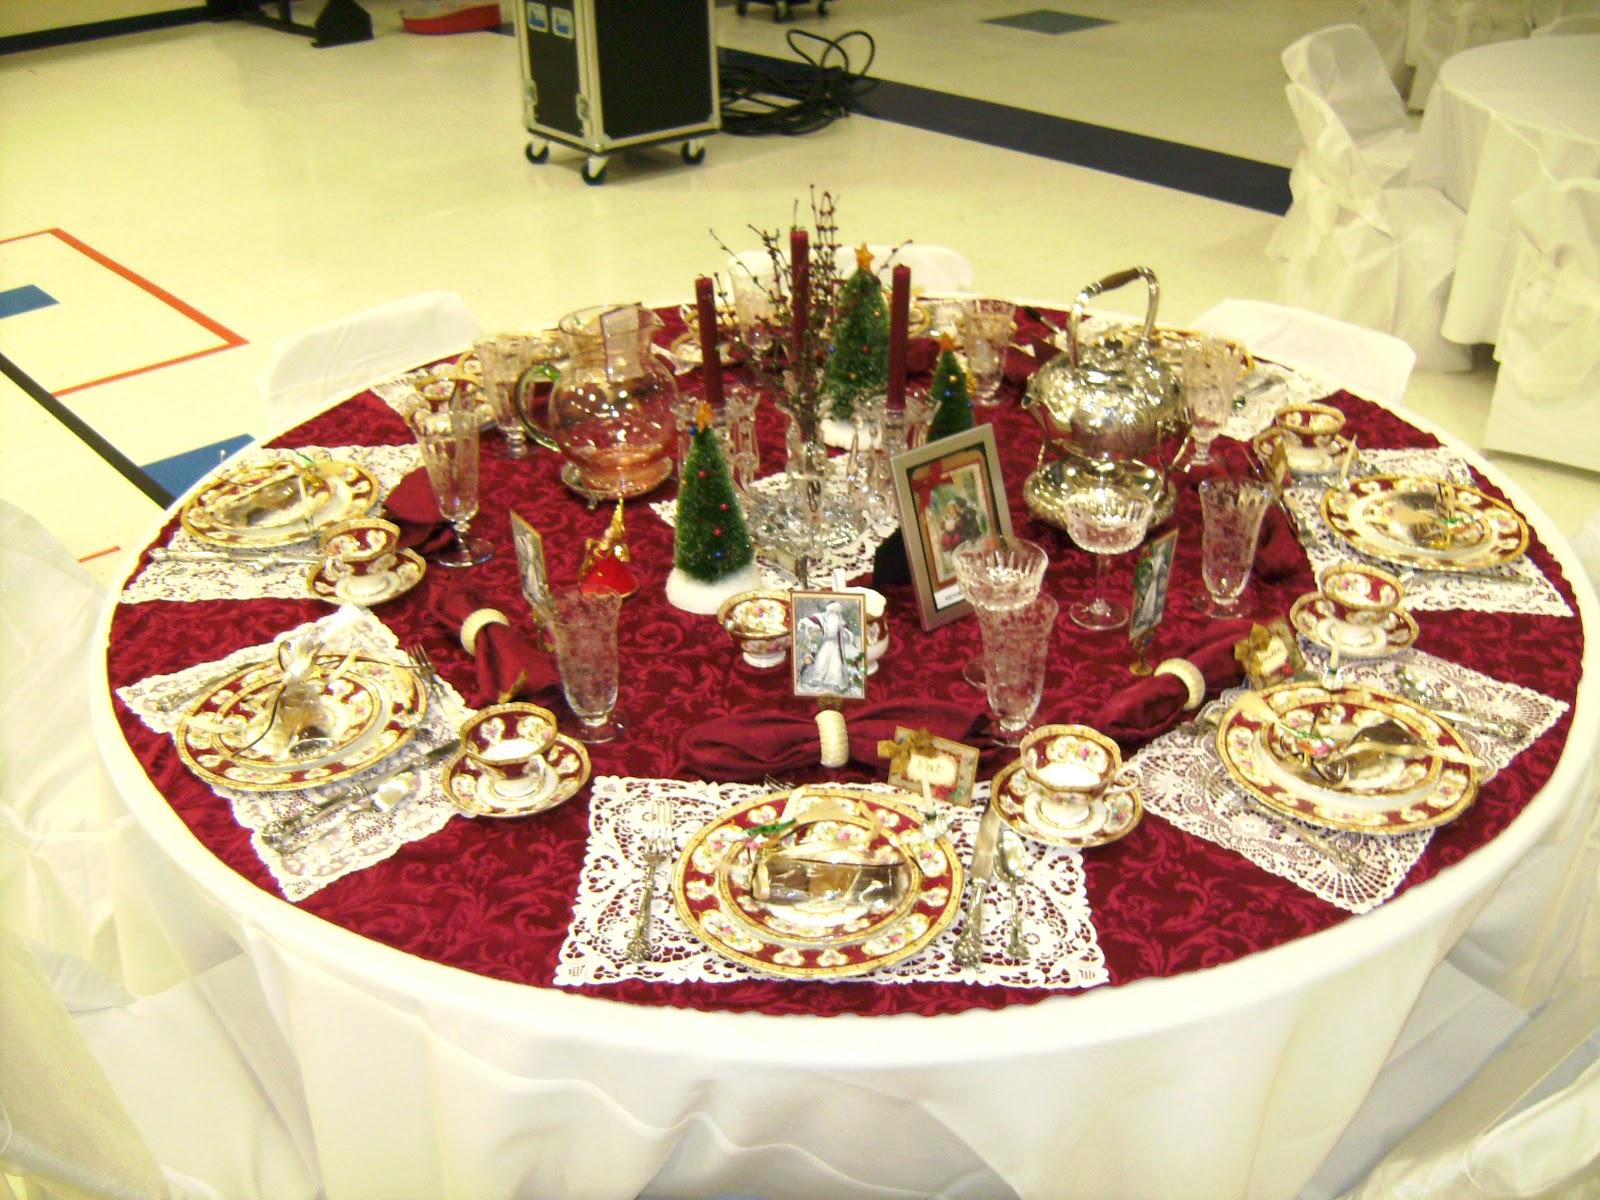 Relevant Tea Leaf 2008 Christmas Tea Tablescapes